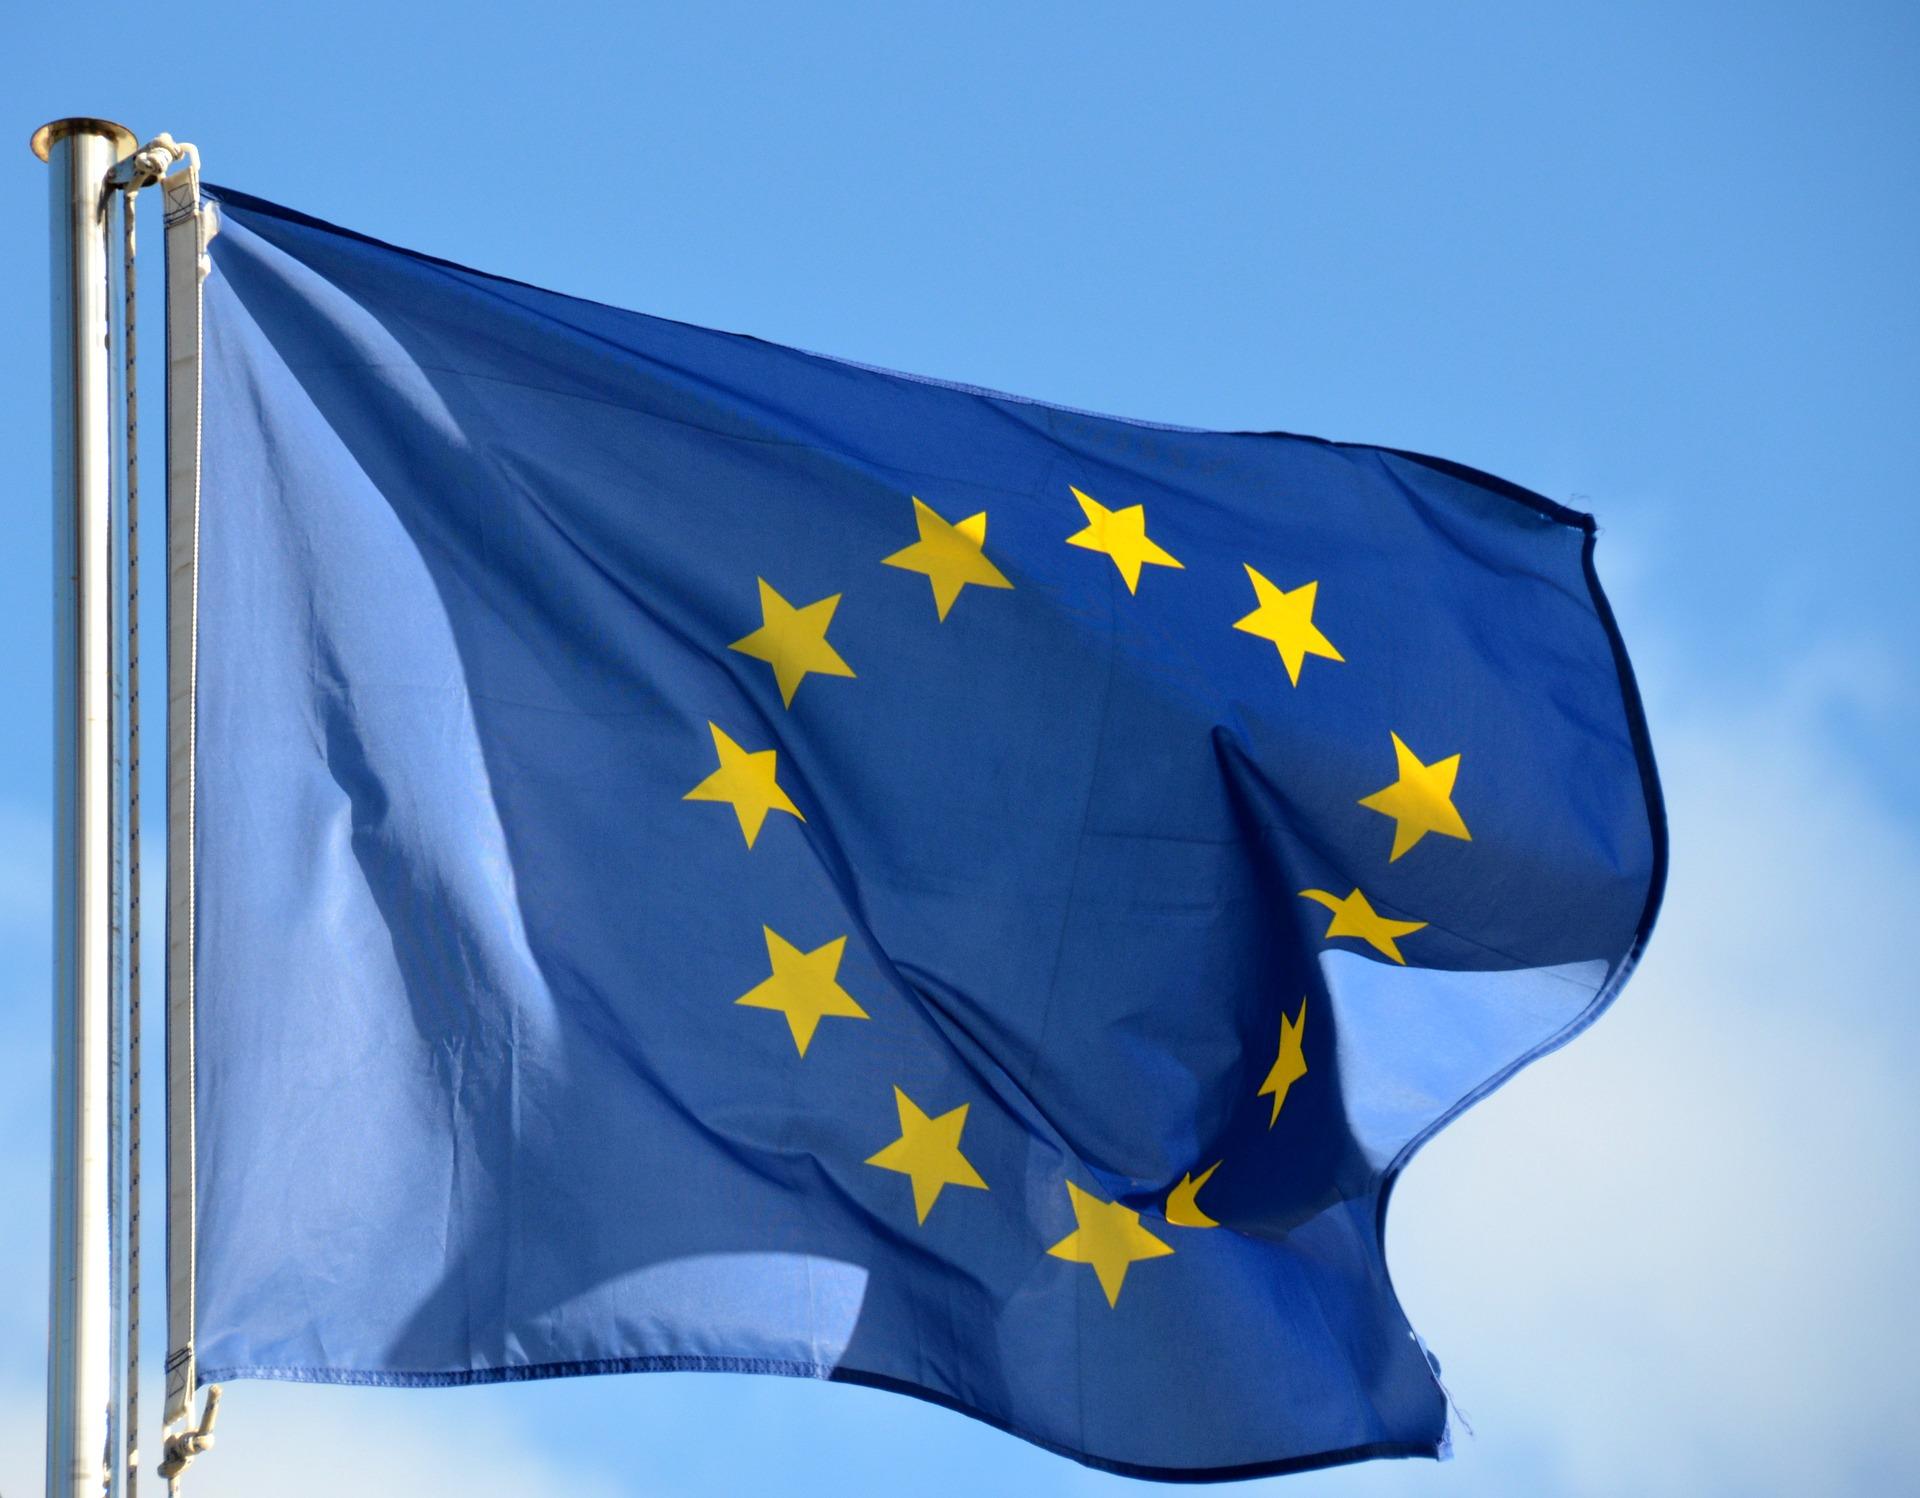 In arrivo fondi europei per il digitale.